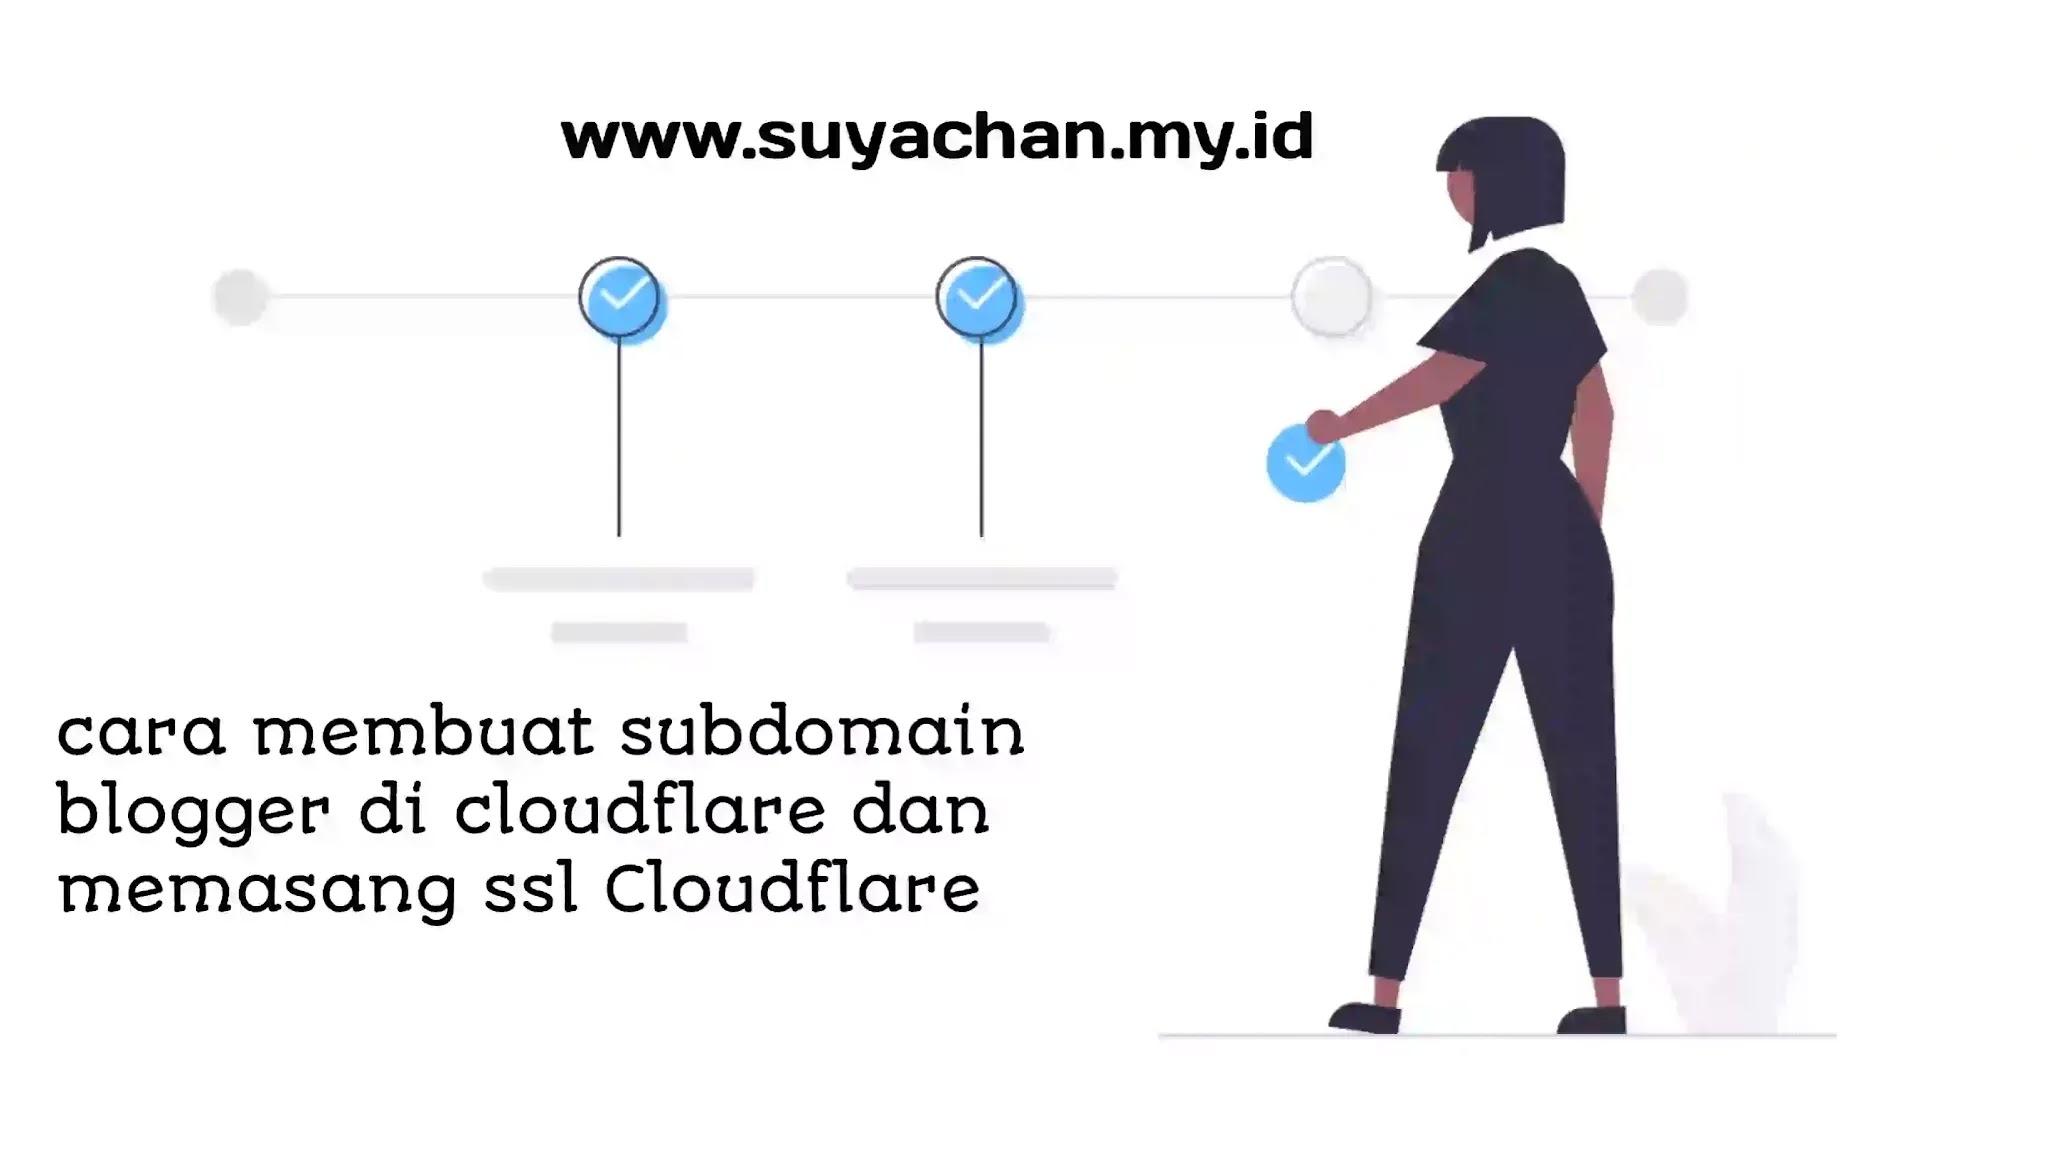 cara membuat subdomain blogger di cloudflare dan memasang ssl untuk subdomain Cloudflare